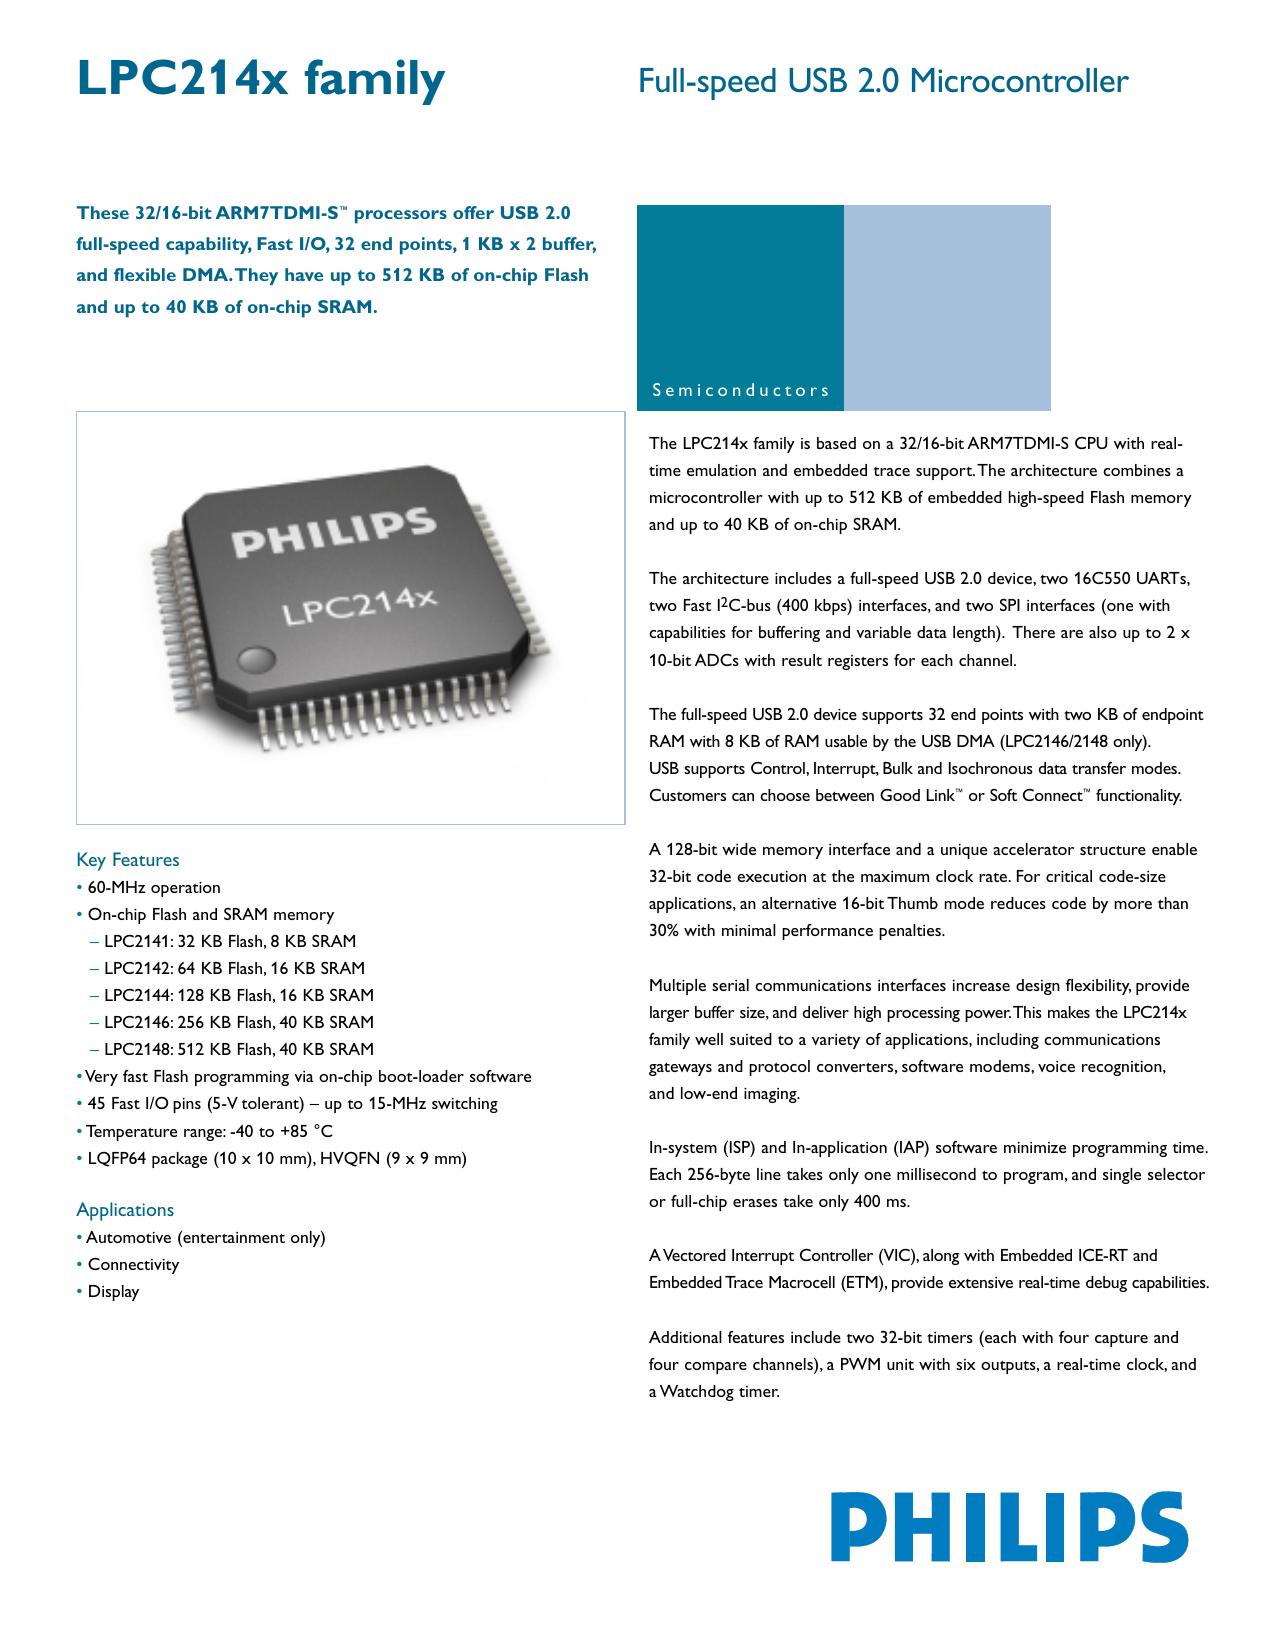 PHILIPS LPC214X USB WINDOWS 10 DRIVERS DOWNLOAD